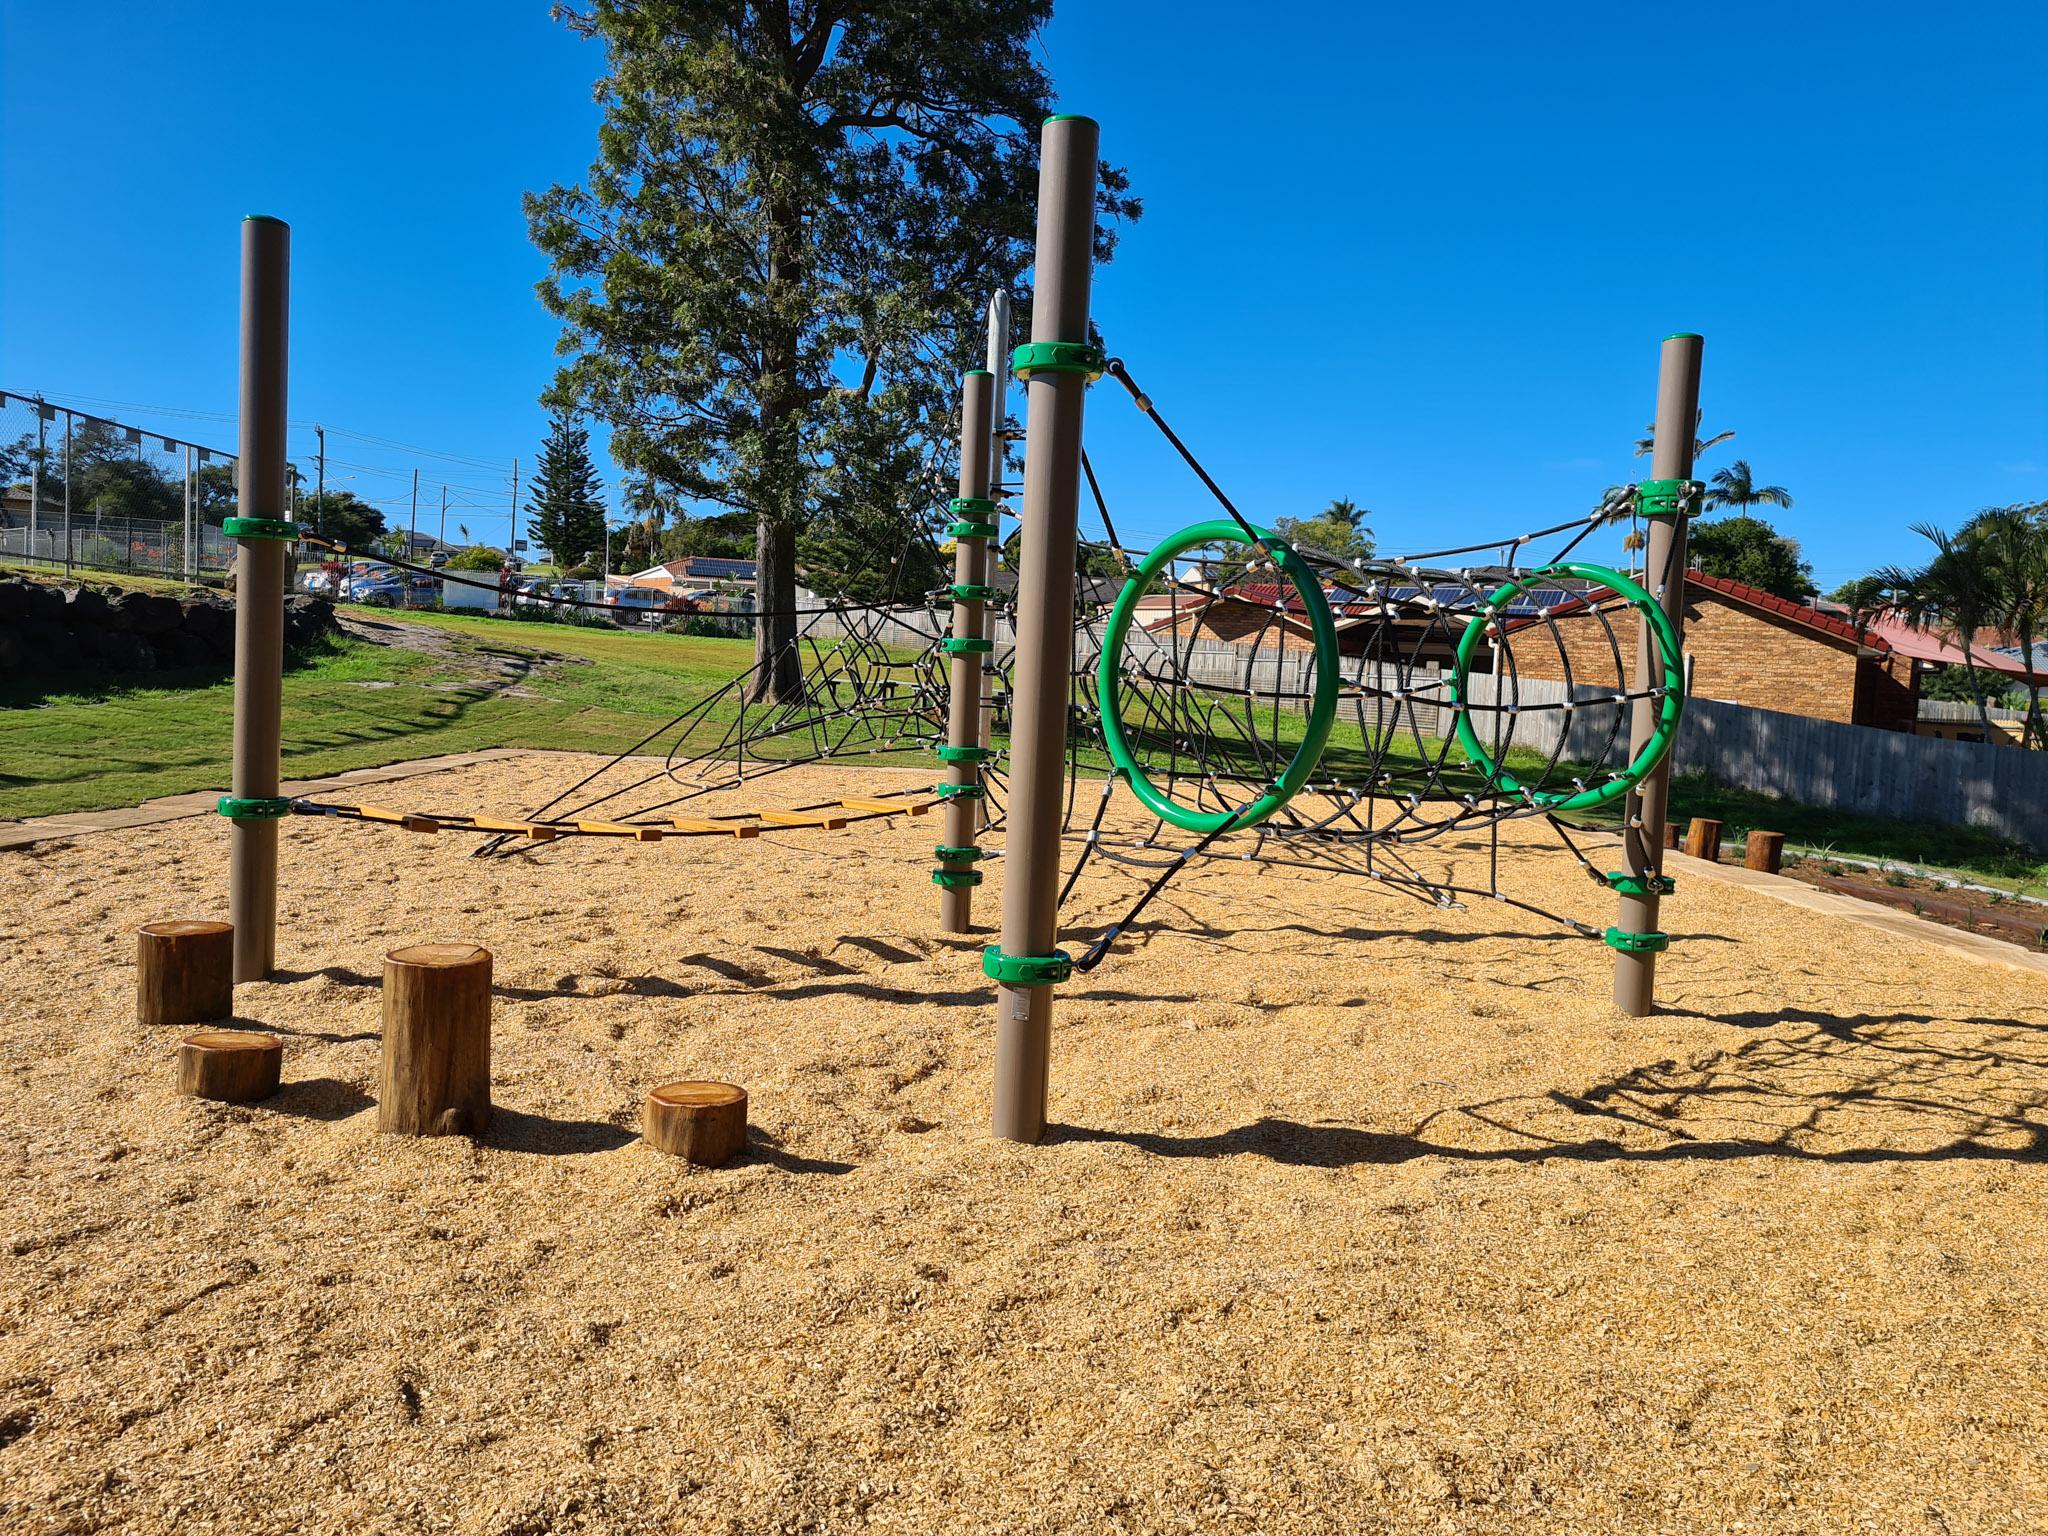 palm-beach-state-school-playrground-austek-play-24